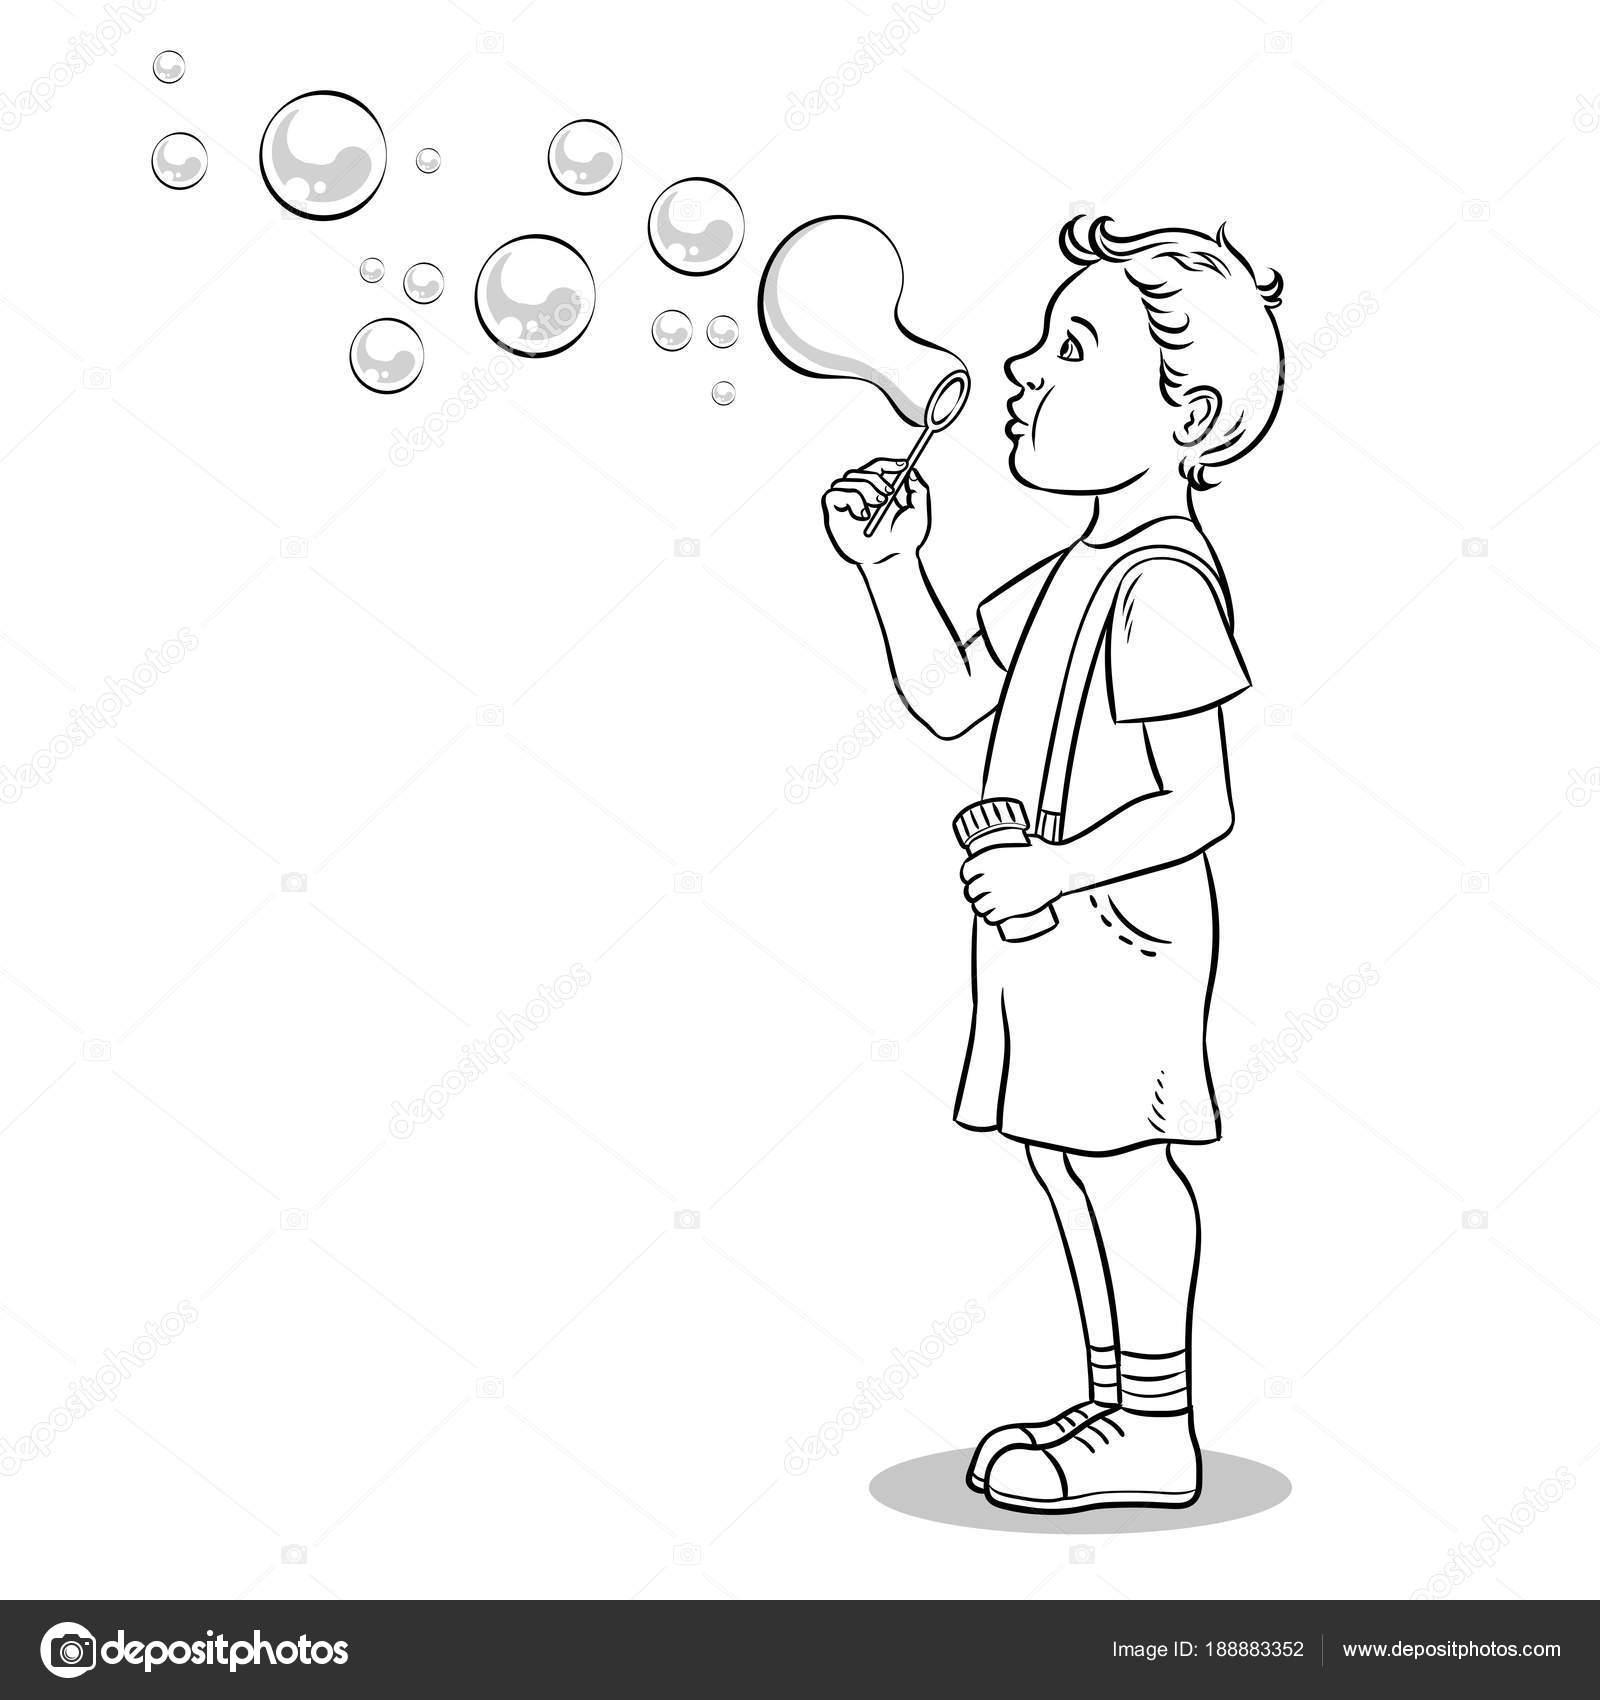 Encantador Cachorro De Burbujas Para Colorear Imagen - Dibujos Para ...